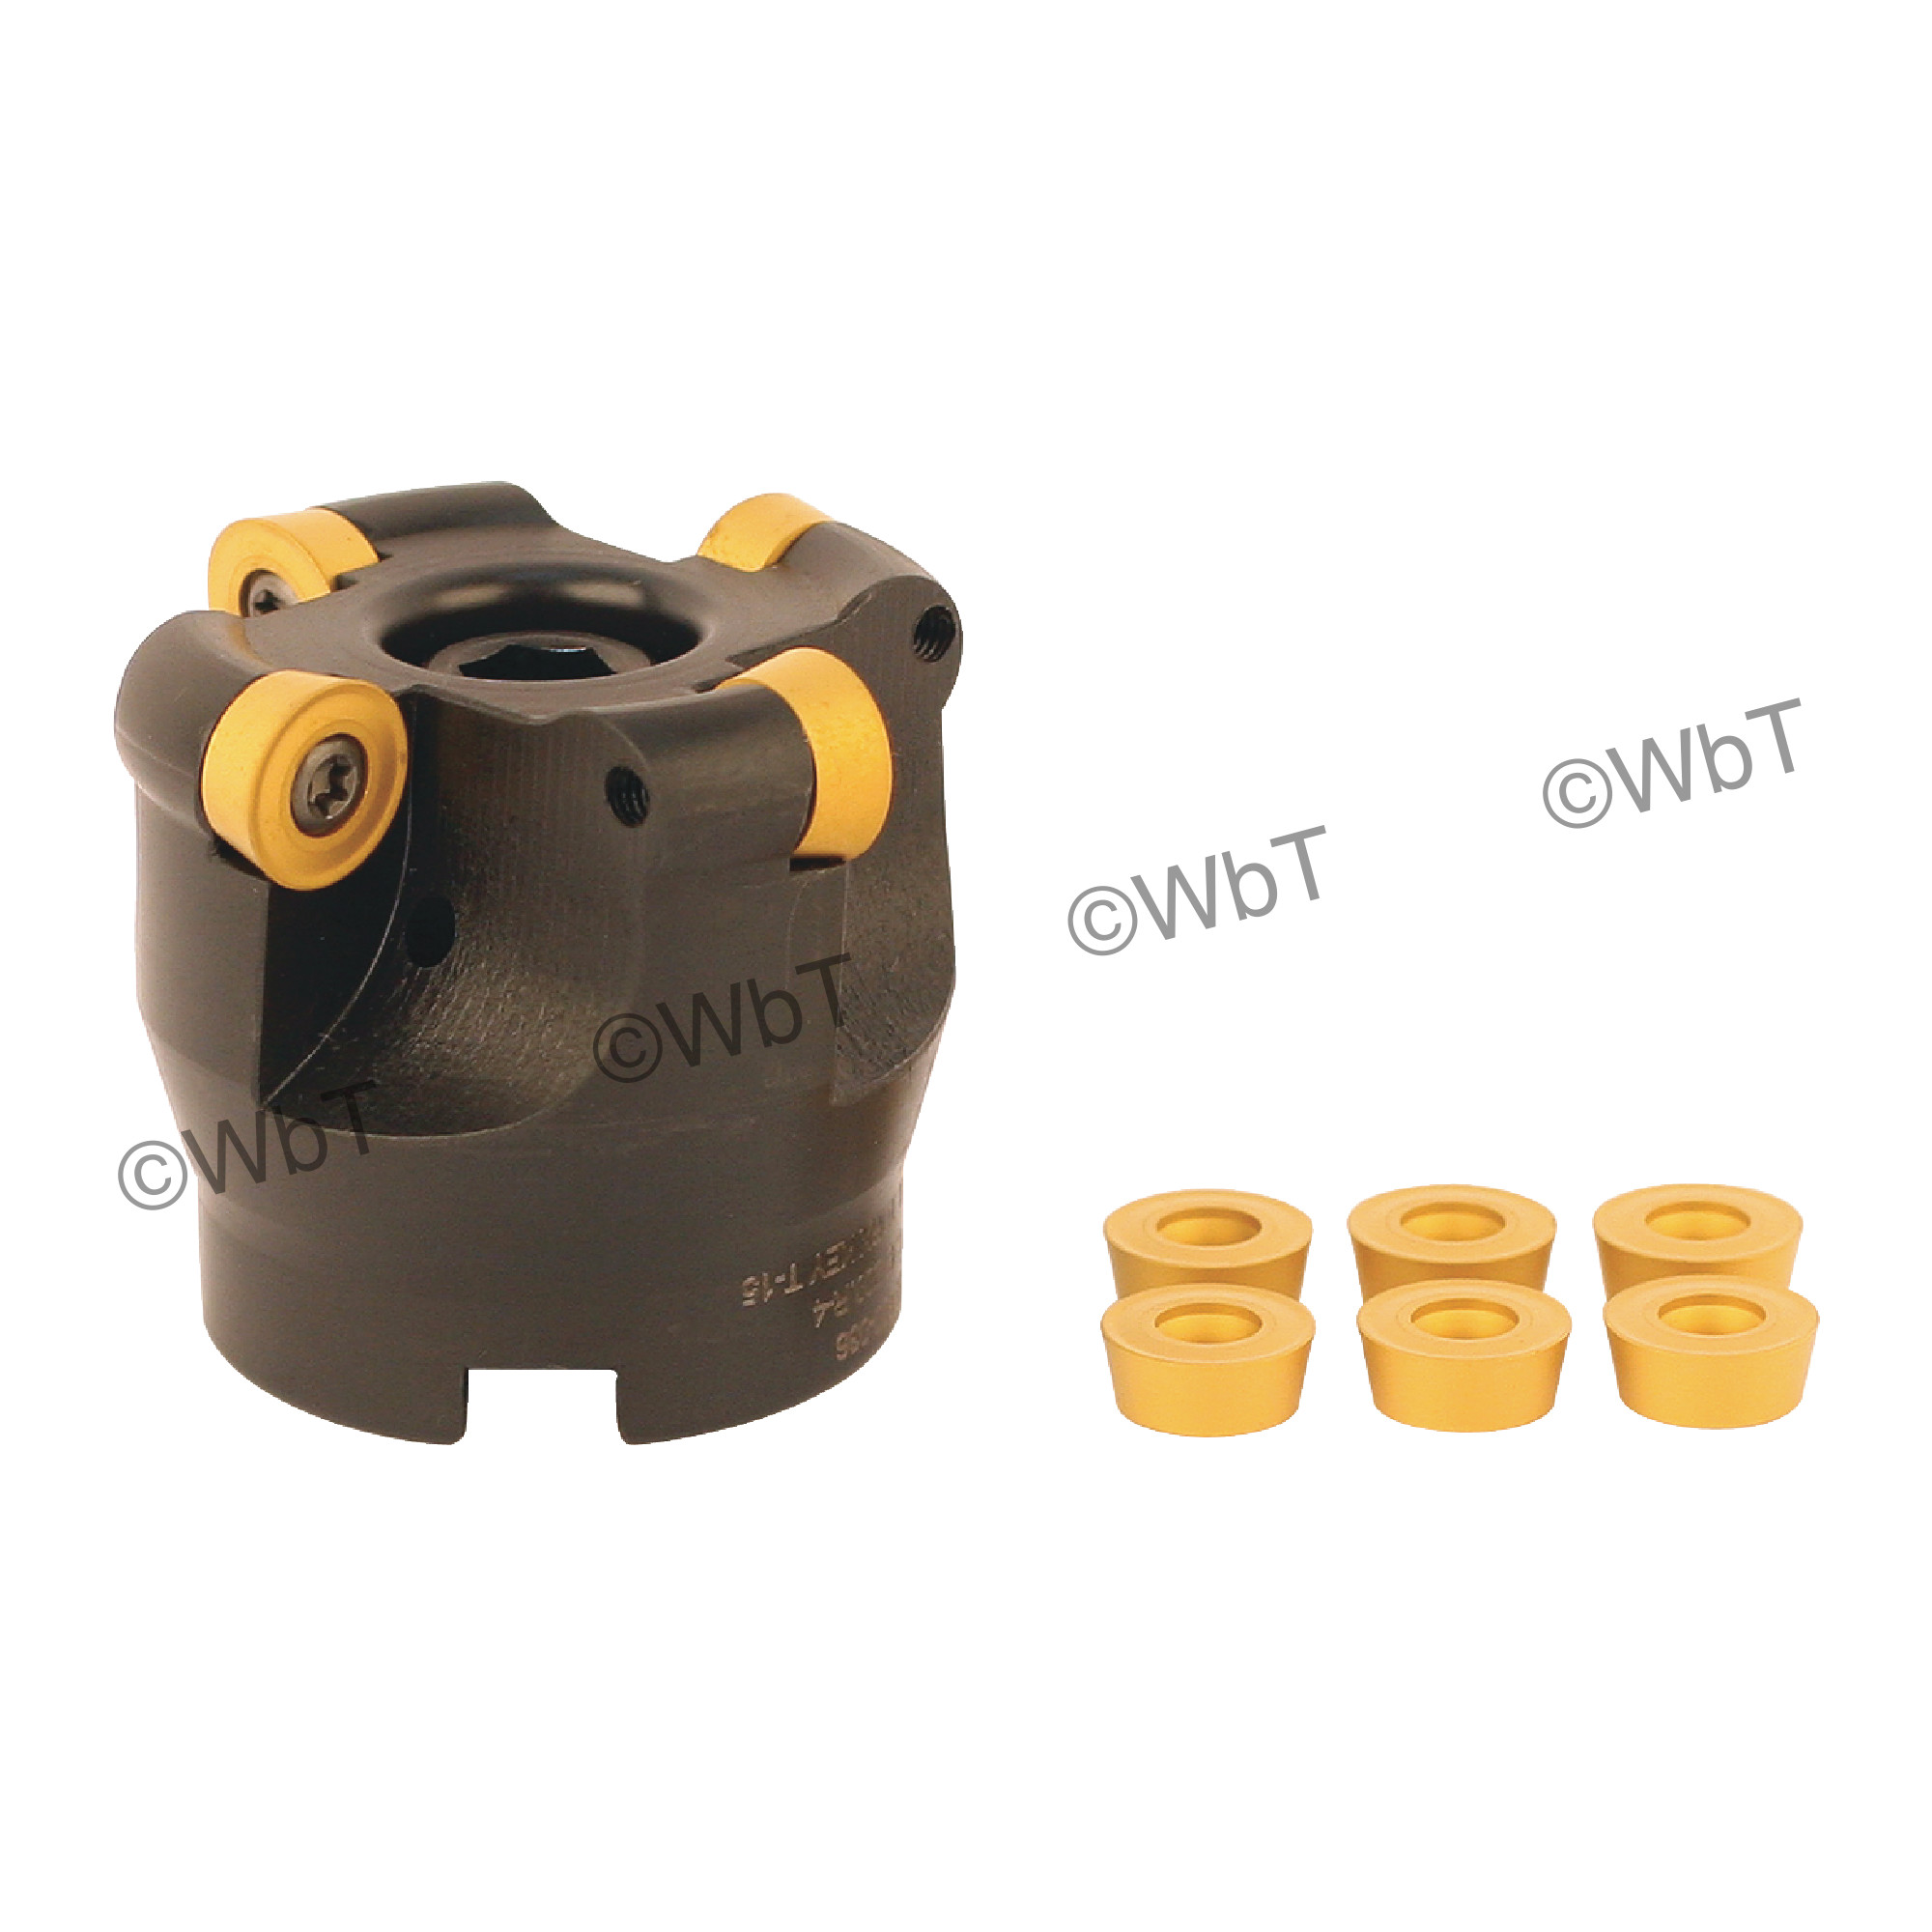 "AKUMA - 2.000"" Face Mill Set / Includes: (1) RPC.43.200R-4 (2.0""ø) & (10) RPMT1204M0S-M1 CM30P Coated Inserts / R"